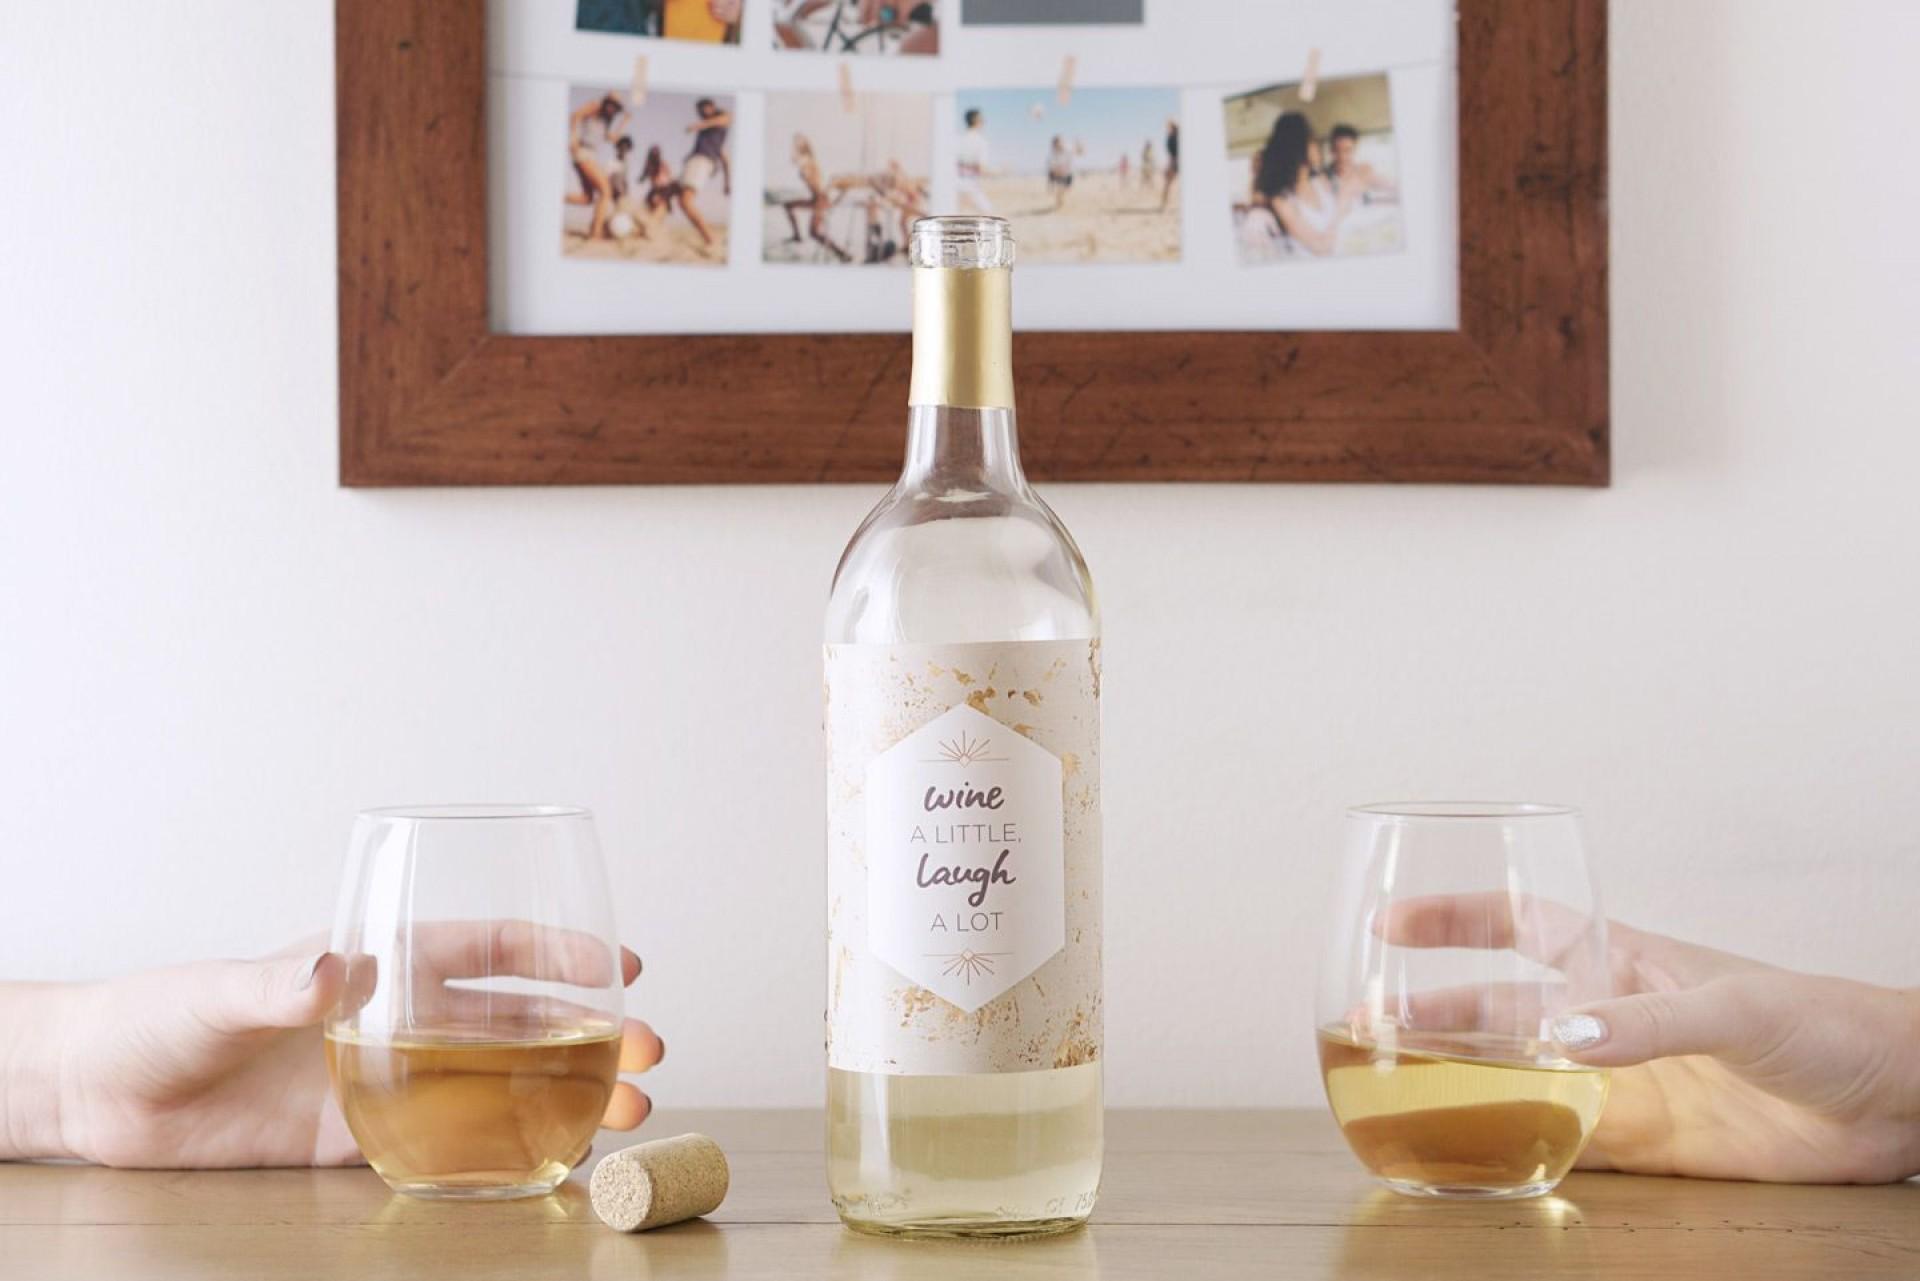 007 Stupendou Free Wine Label Template Image  Online Custom Downloadable Bottle1920